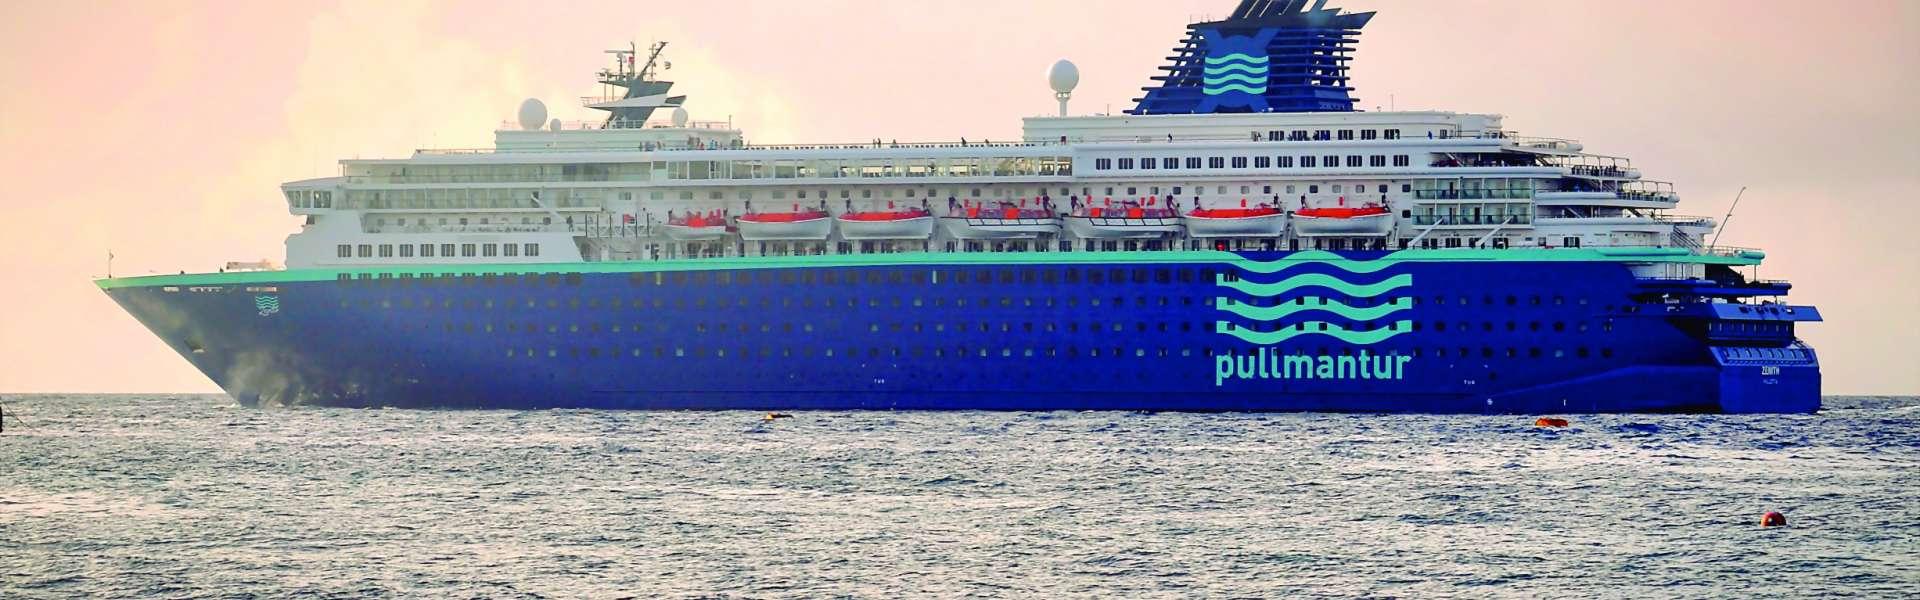 Croaziera 2018/2019 - Insulele Canare (Tenerife) - Pullmantur Cruises - Zenith - 7 nopti